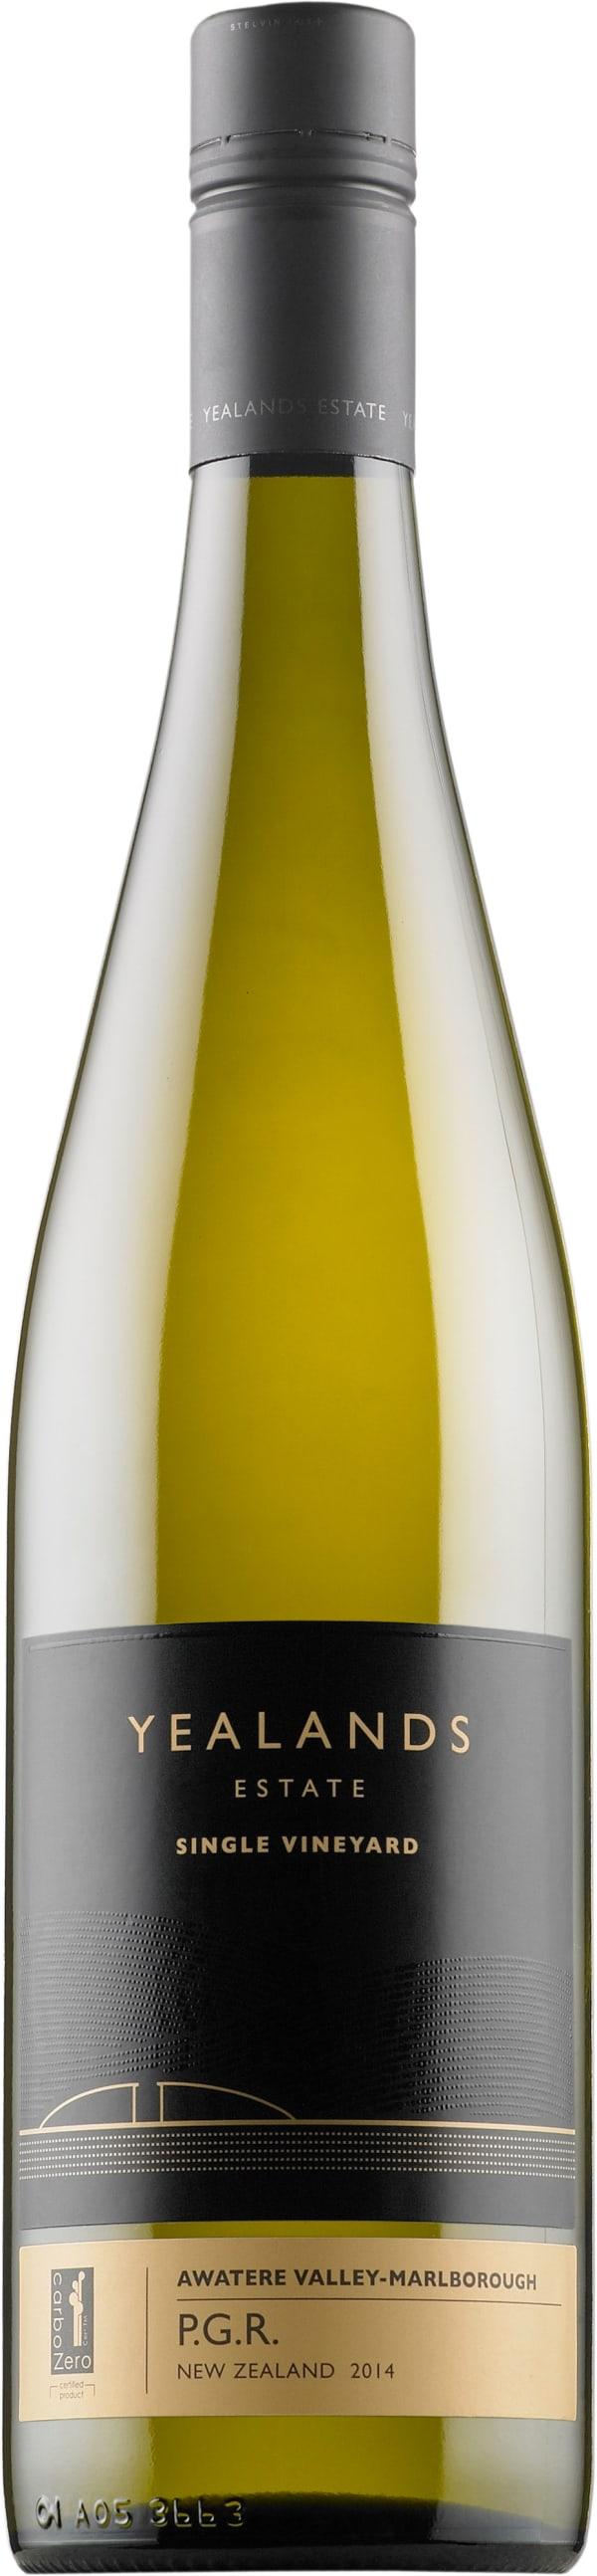 Yealands Estate Single Vineyard P.G.R. 2015